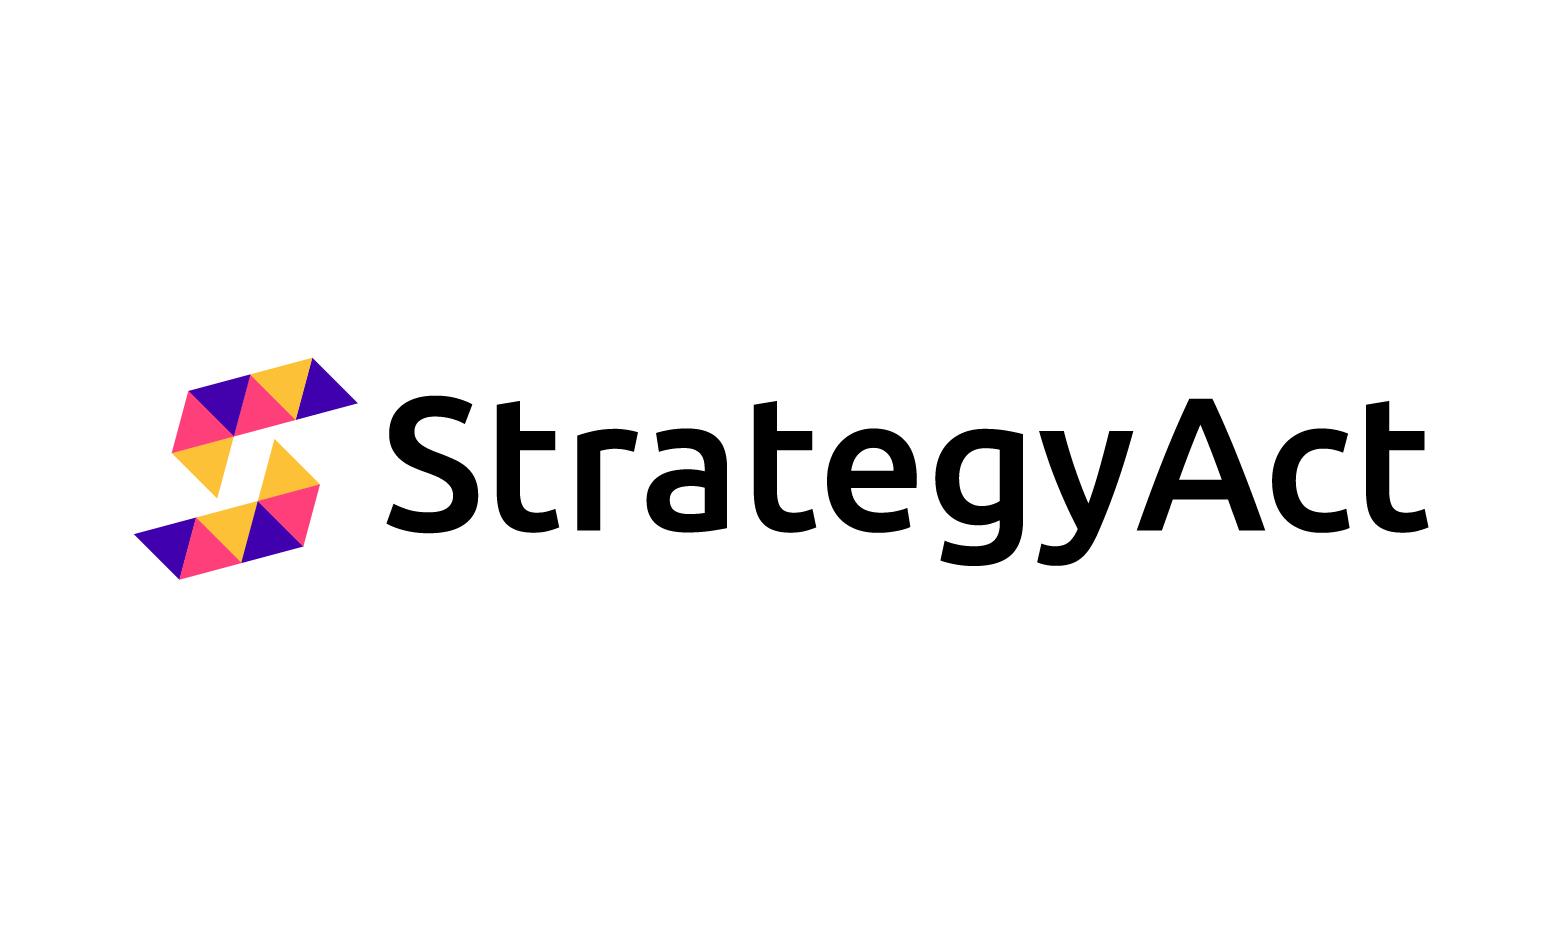 StrategyAct.com